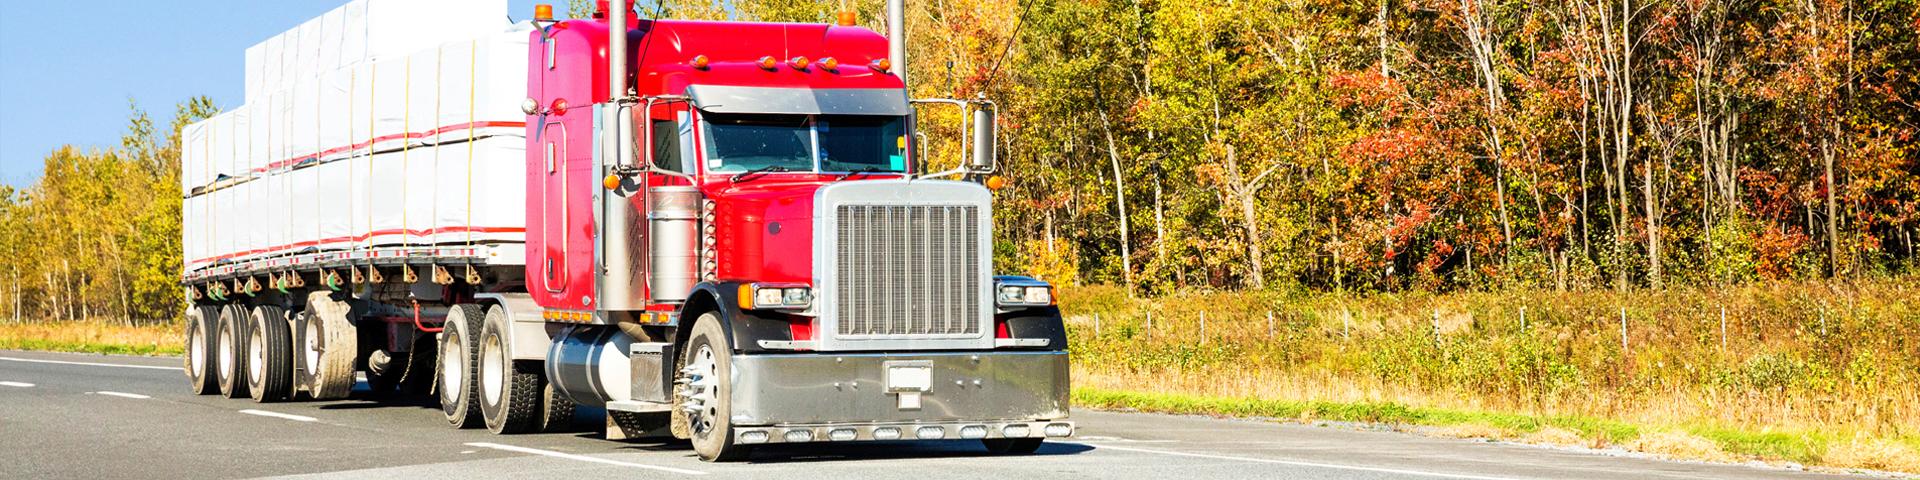 truck_new_2